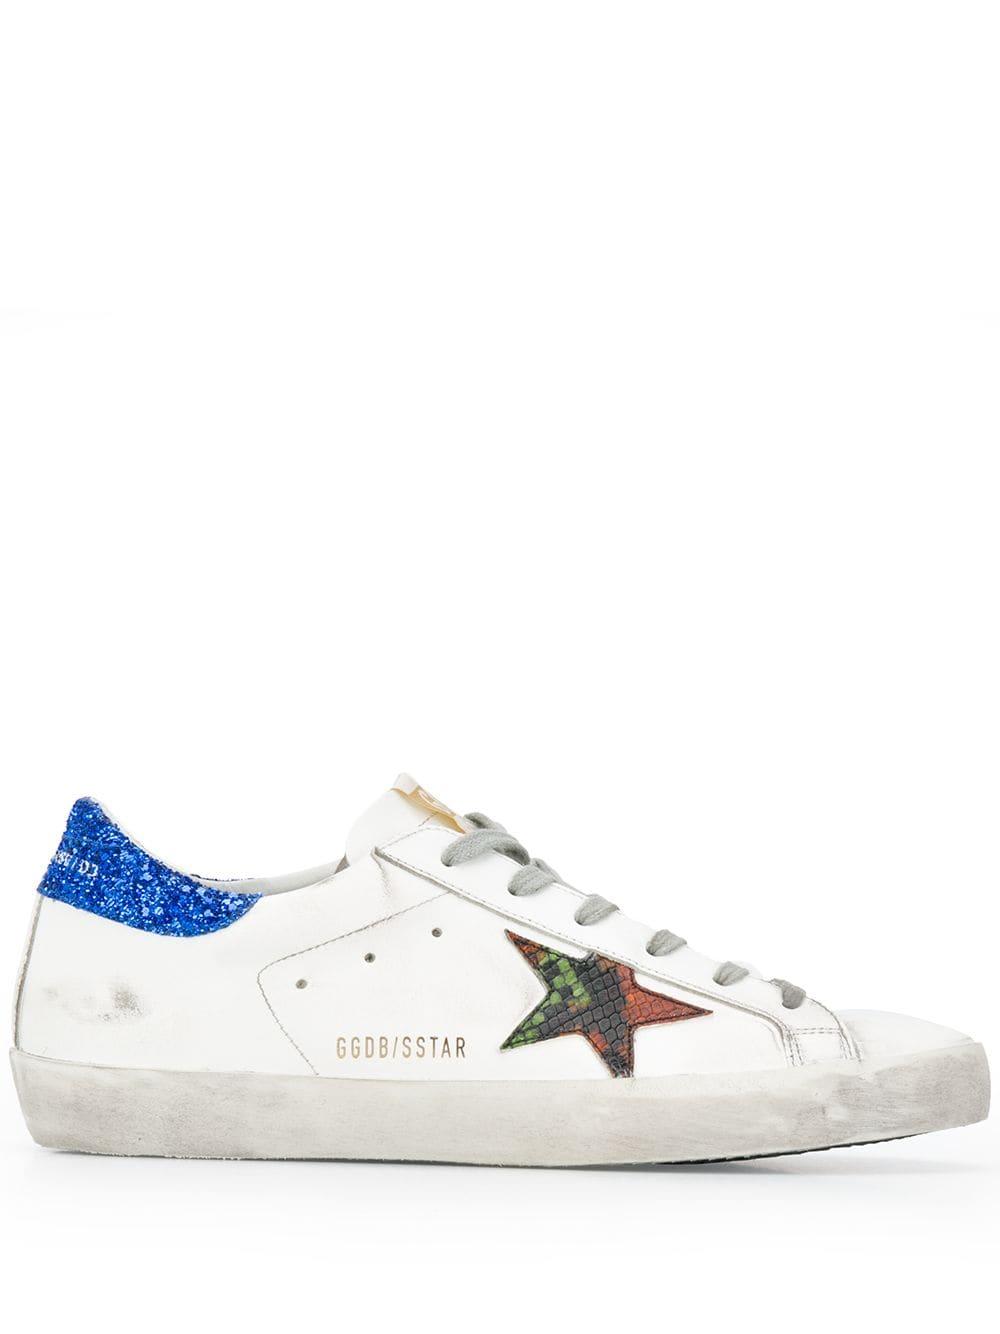 9212a30979f White Superstar Sneakers With Blue Glitter Spoiler - GOLDEN GOOSE -  Russocapri